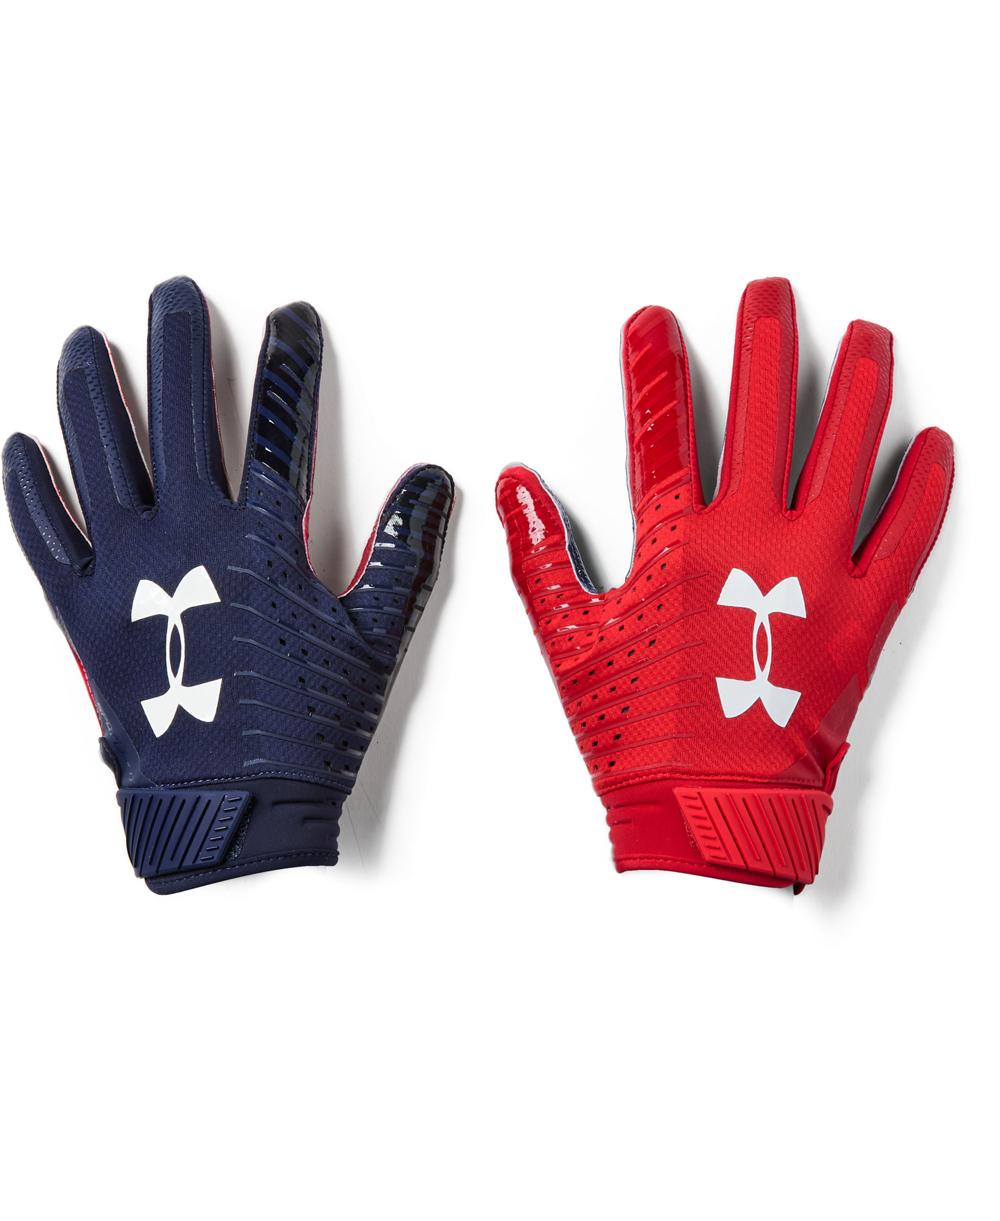 Spotlight LE Herren American Football Handschuhe Midnight Navy 410